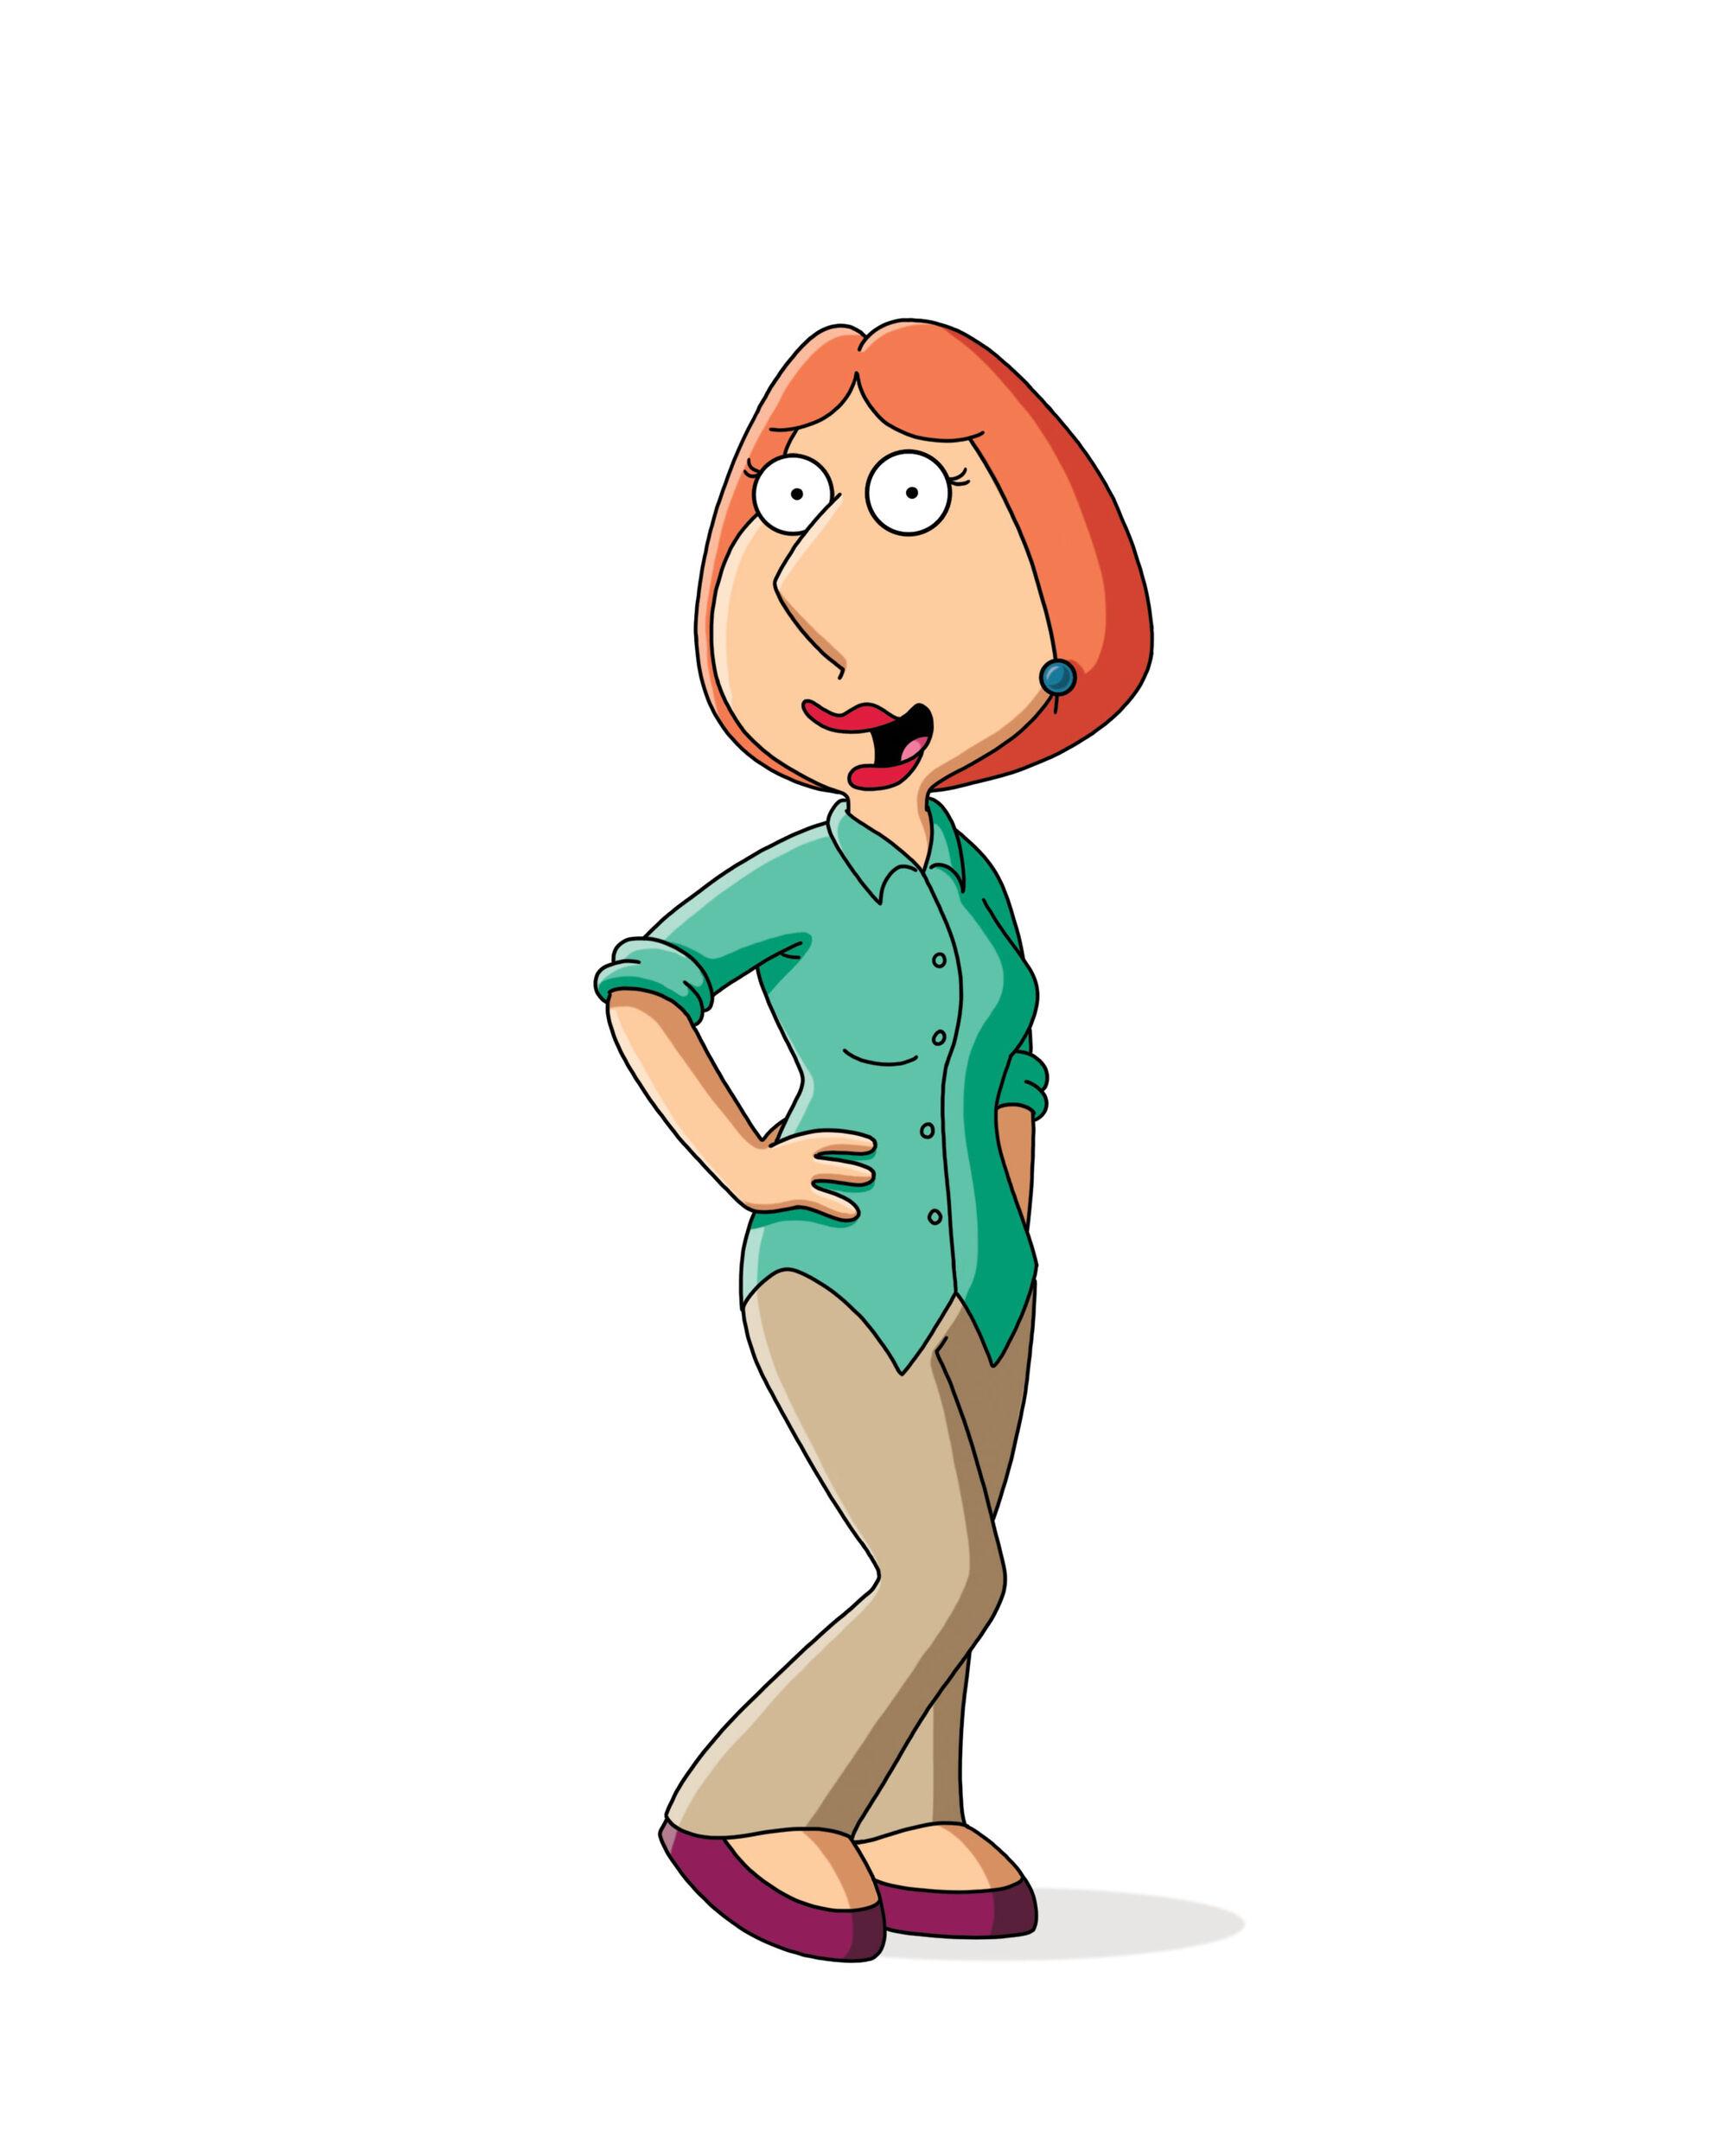 Lois Griffin - Family Guy | Lois griffin, Simpsons art